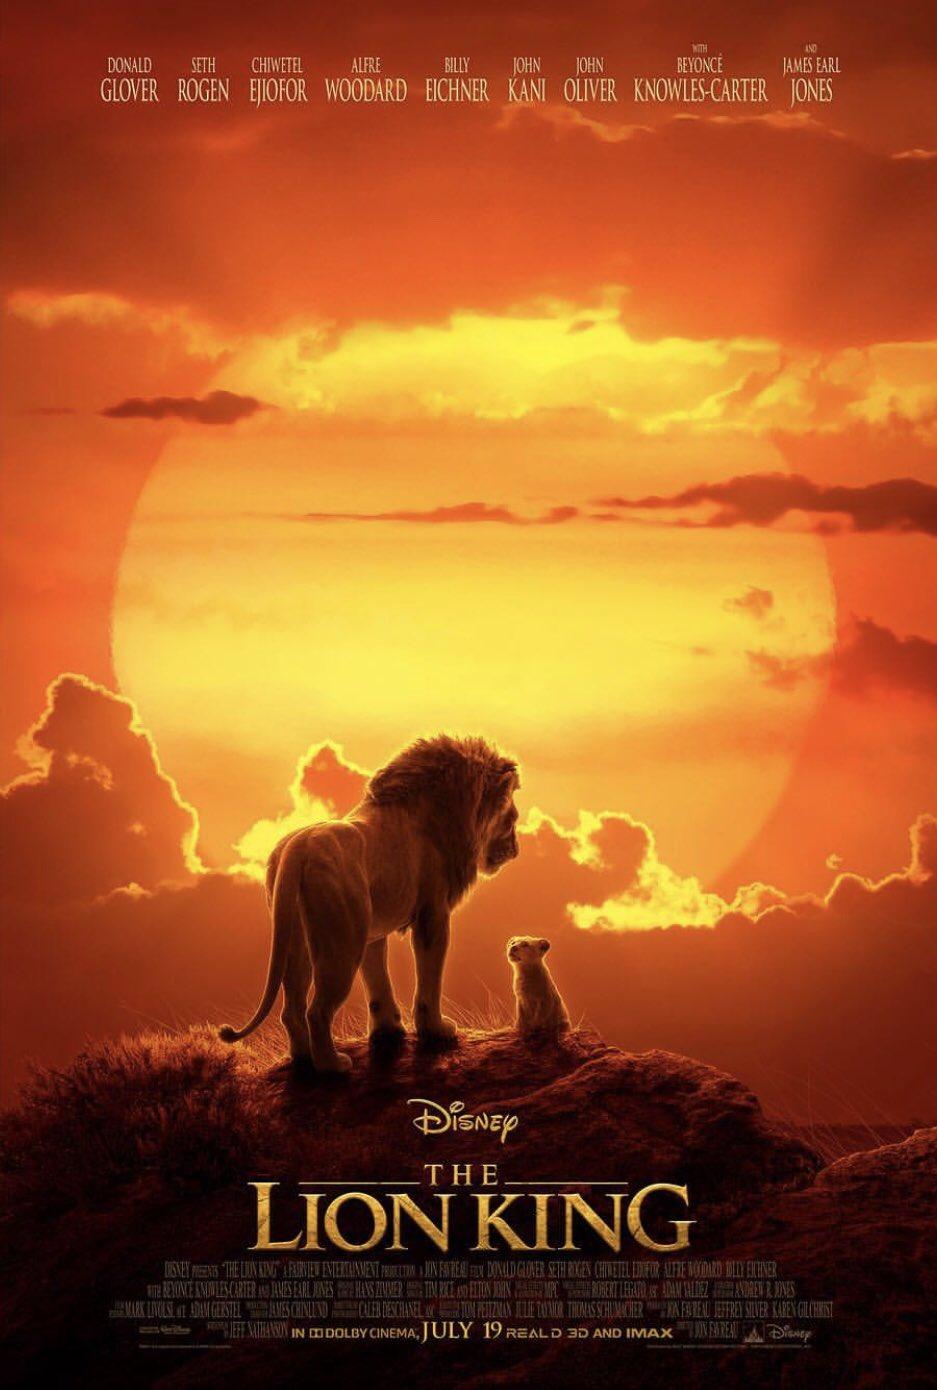 Der König der Löwen TV Spot & Poster